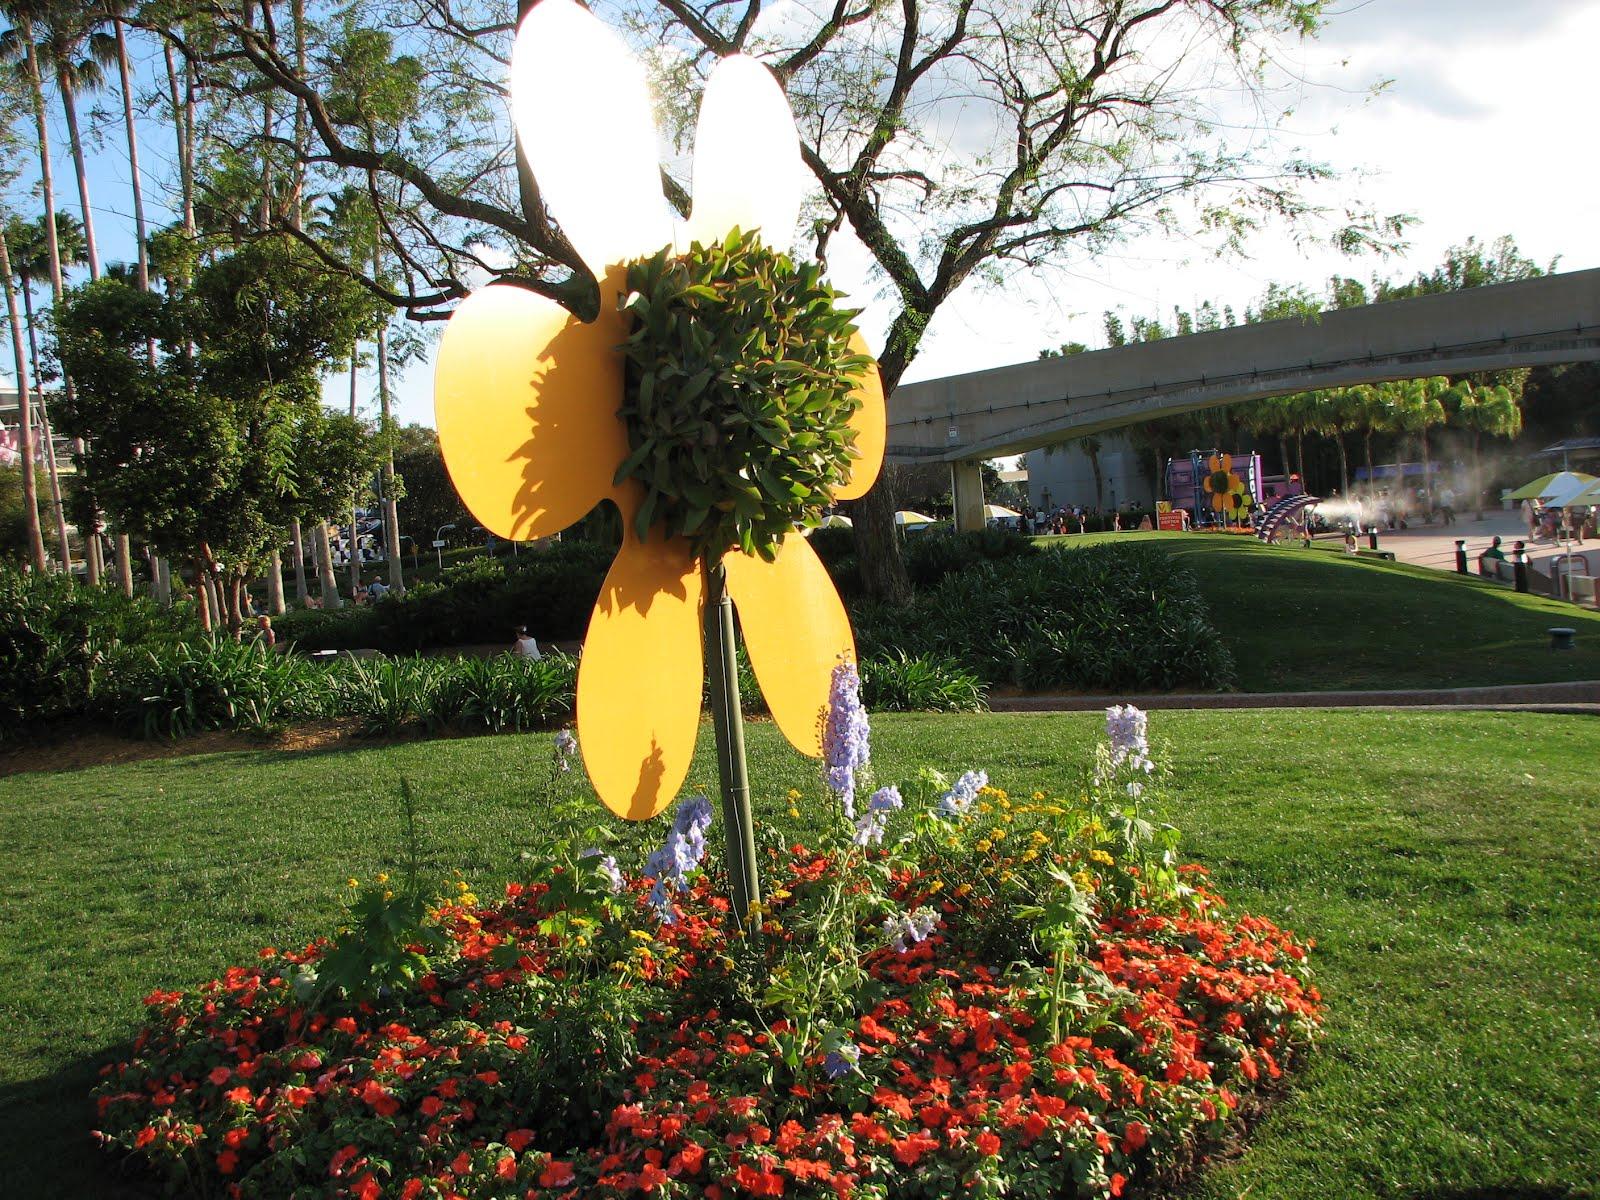 Lema en jardin imagenes for Jardin walt disney